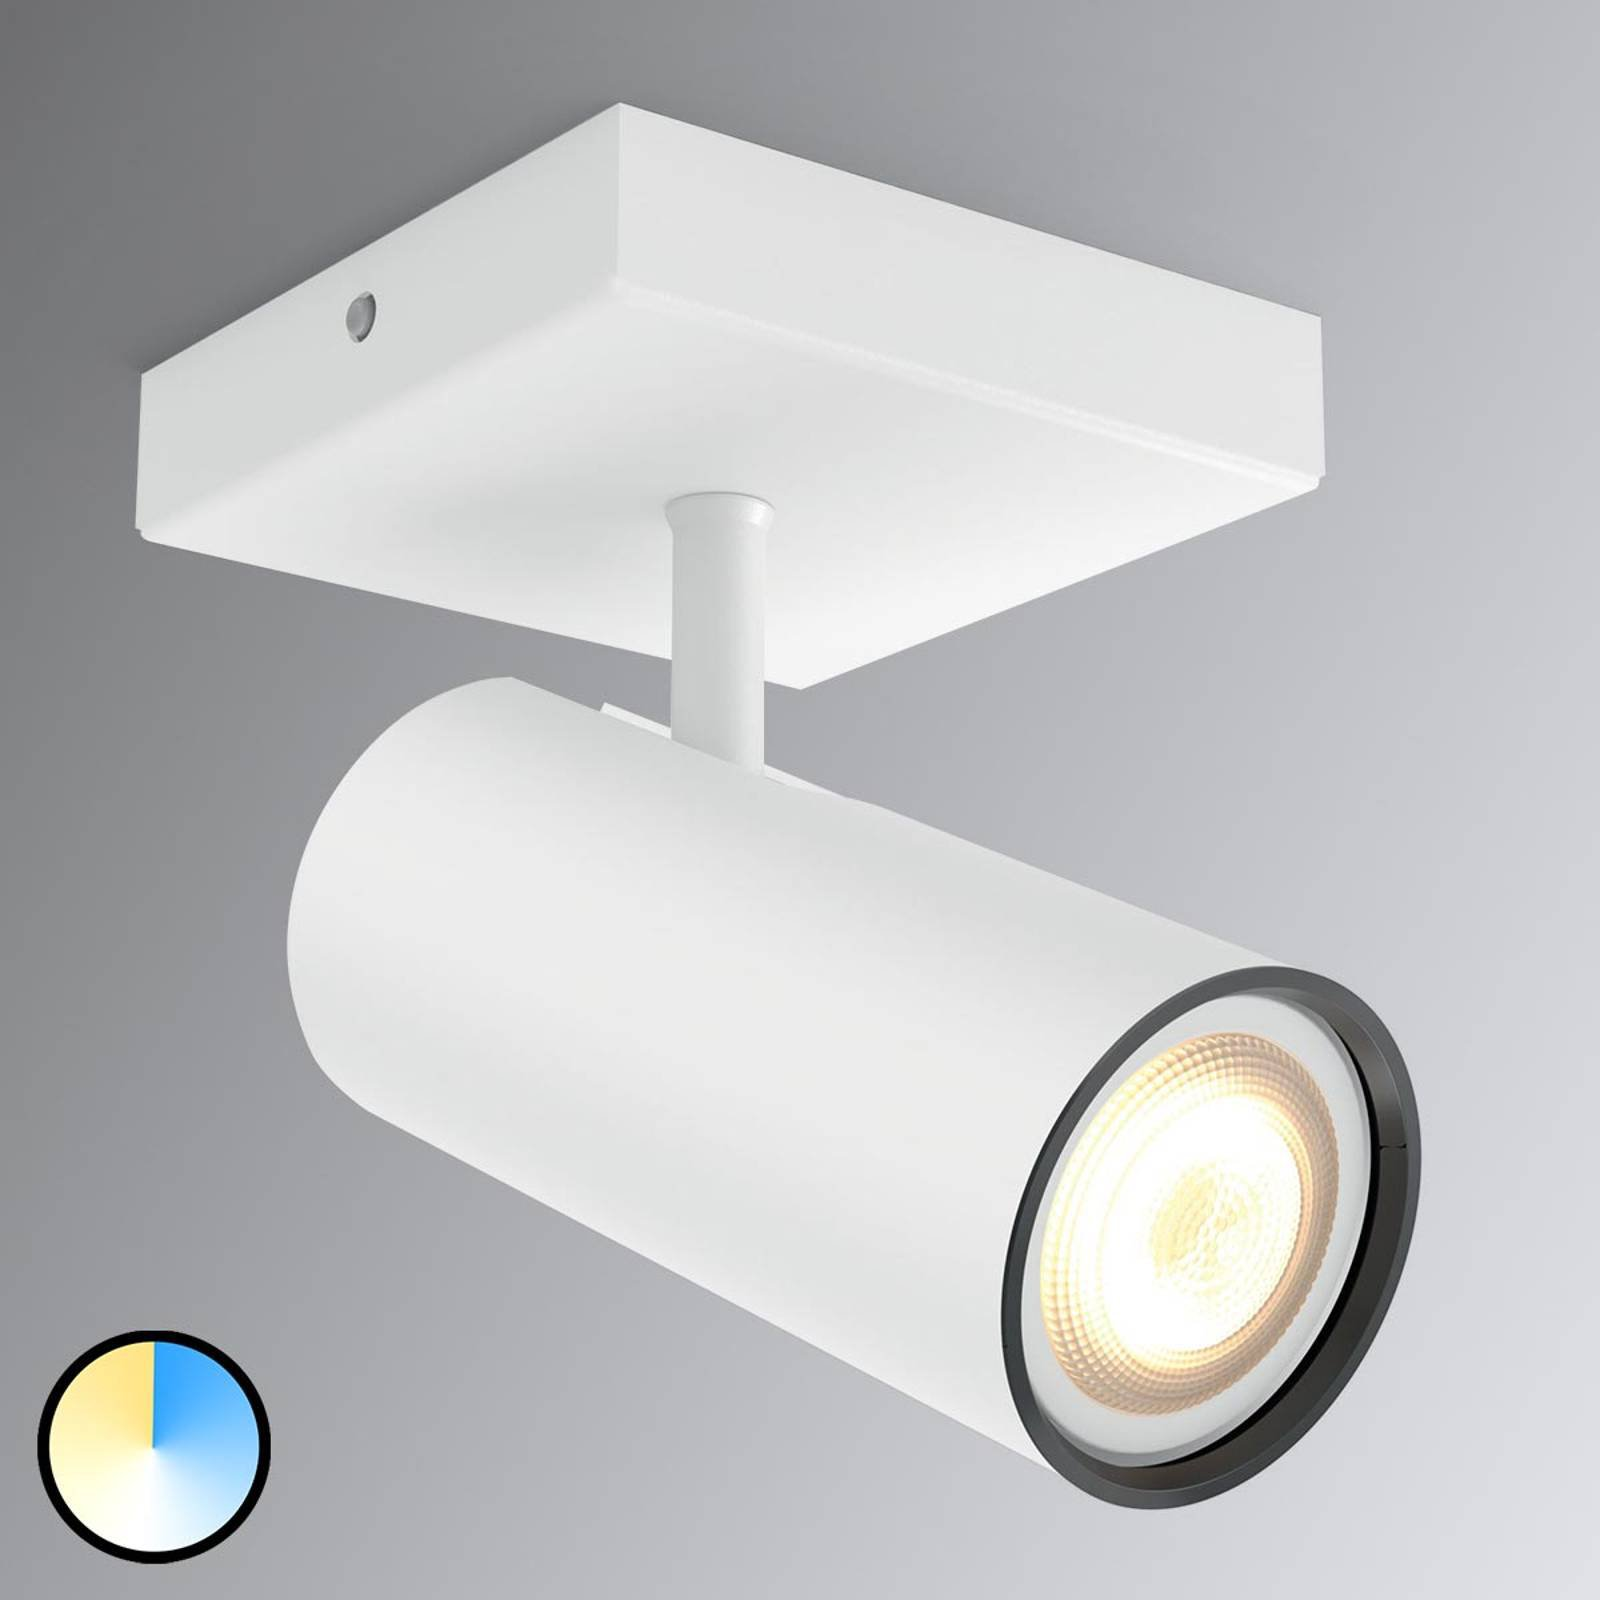 Philips Hue-Buratto LED-spot hvit 1 lyskilde